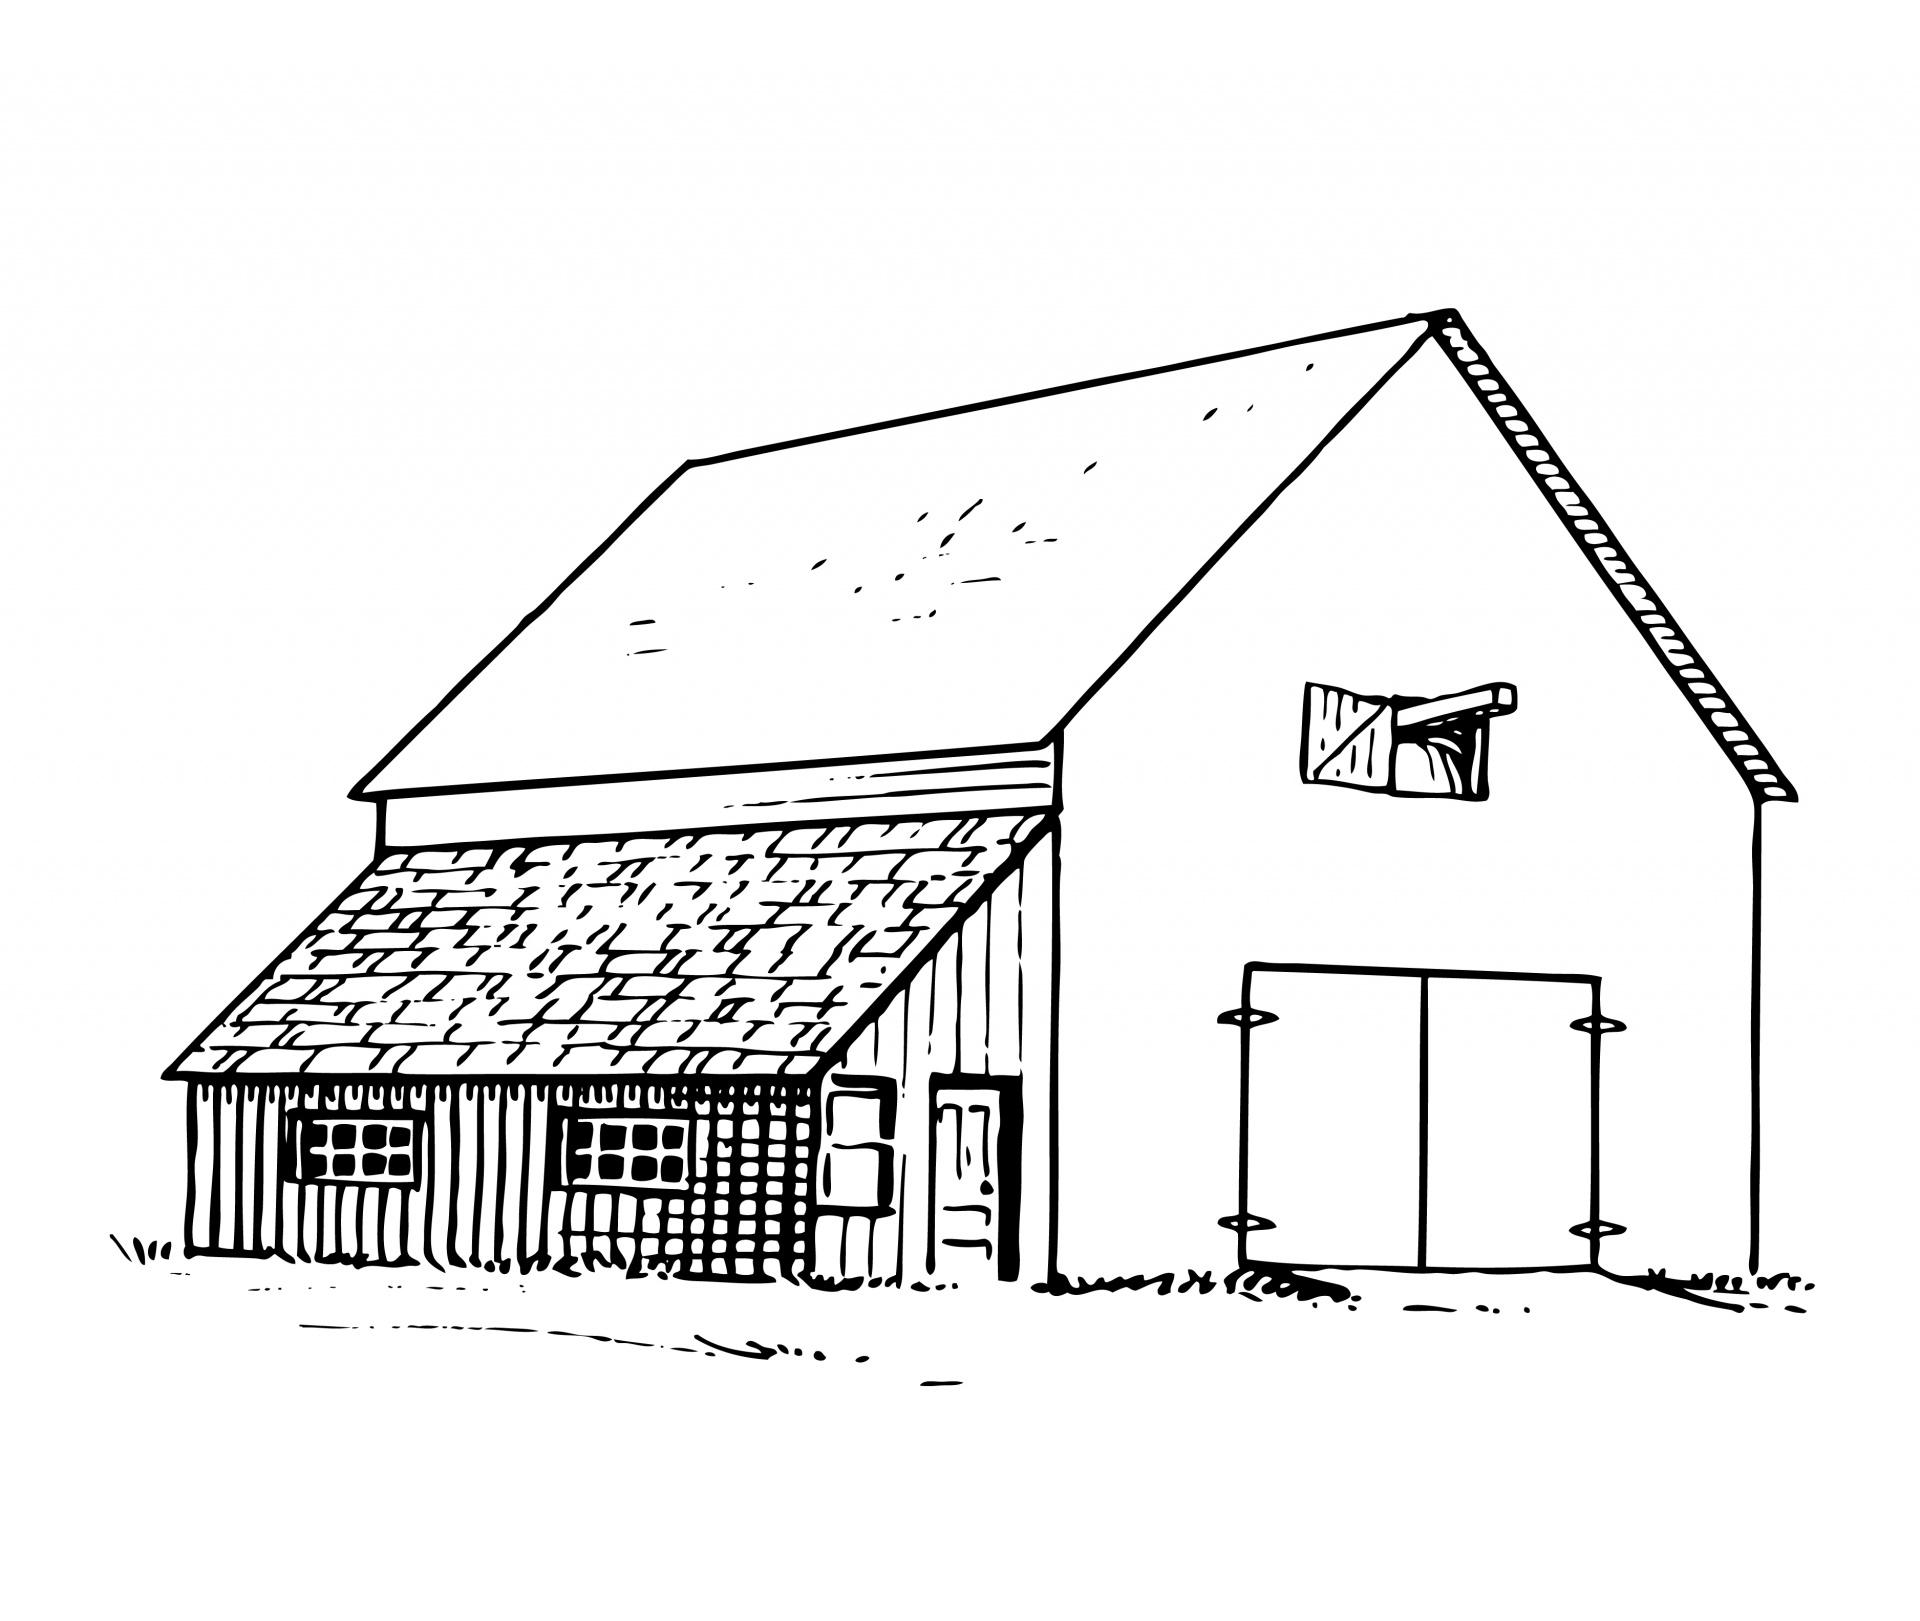 Barn clipart old barn. Illustration free stock photo